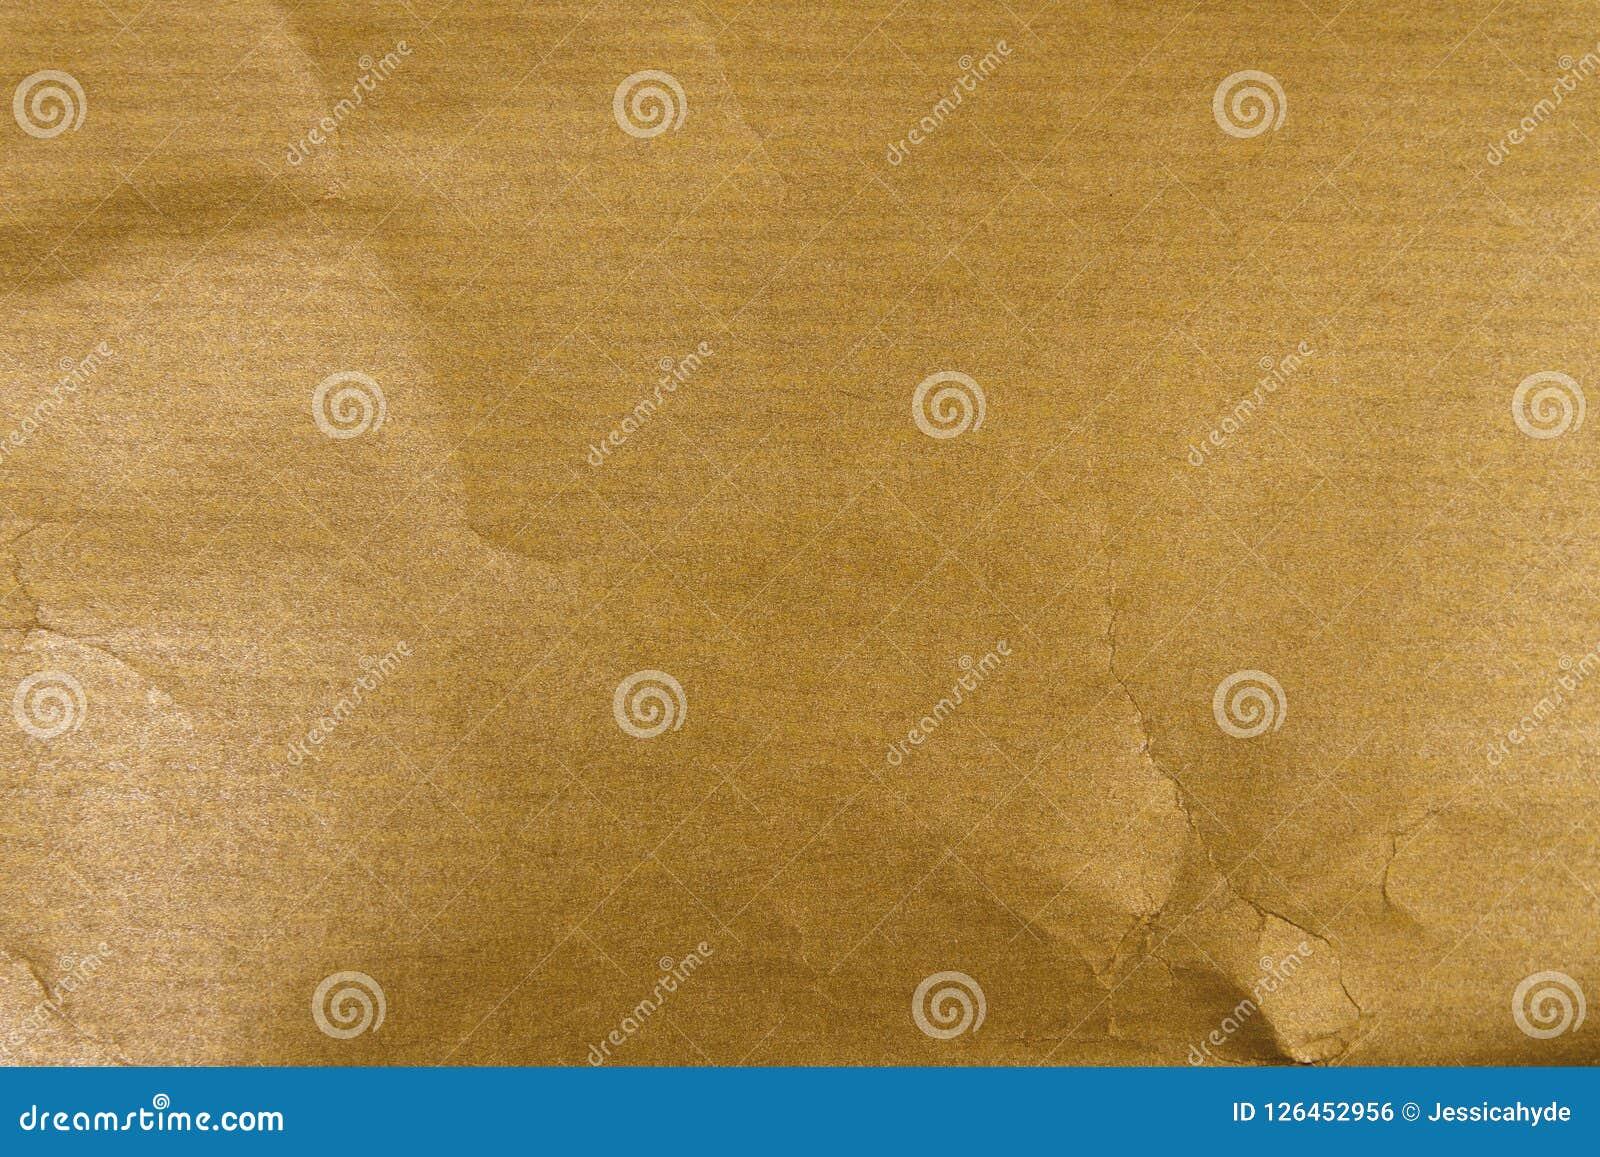 золотая бумага kraft